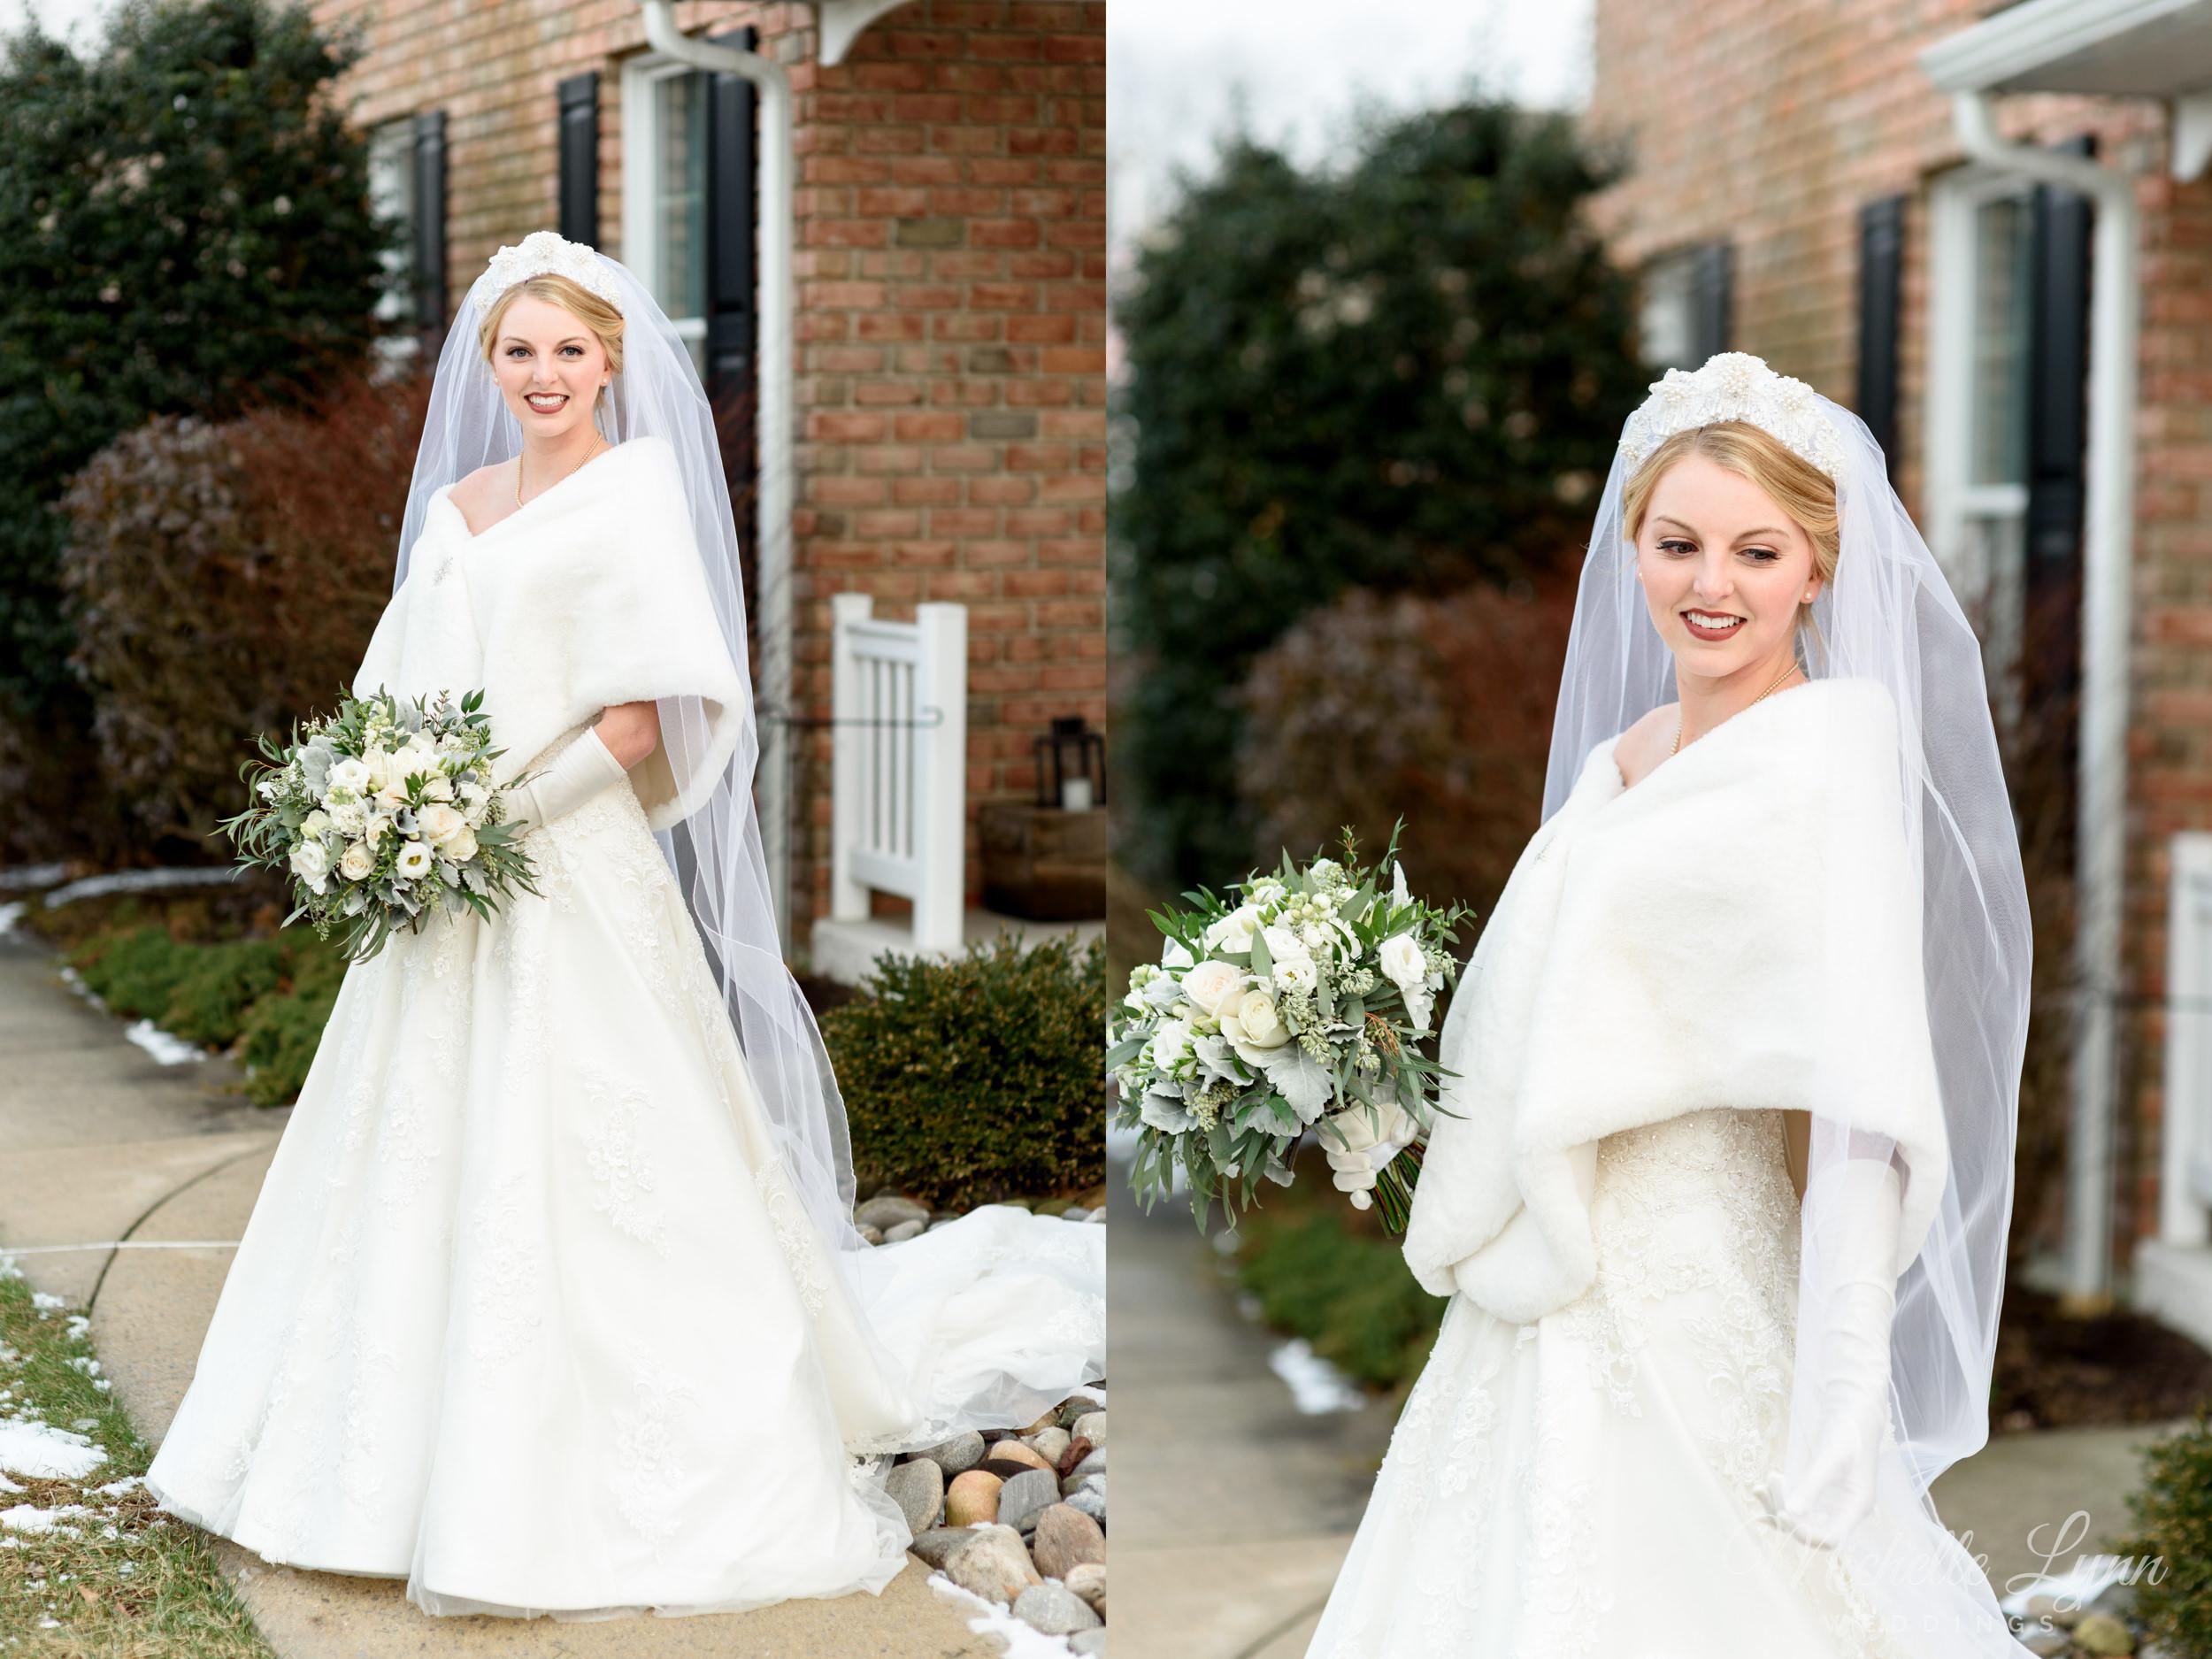 william-penn-inn-wedding-photography-mlw-27.jpg